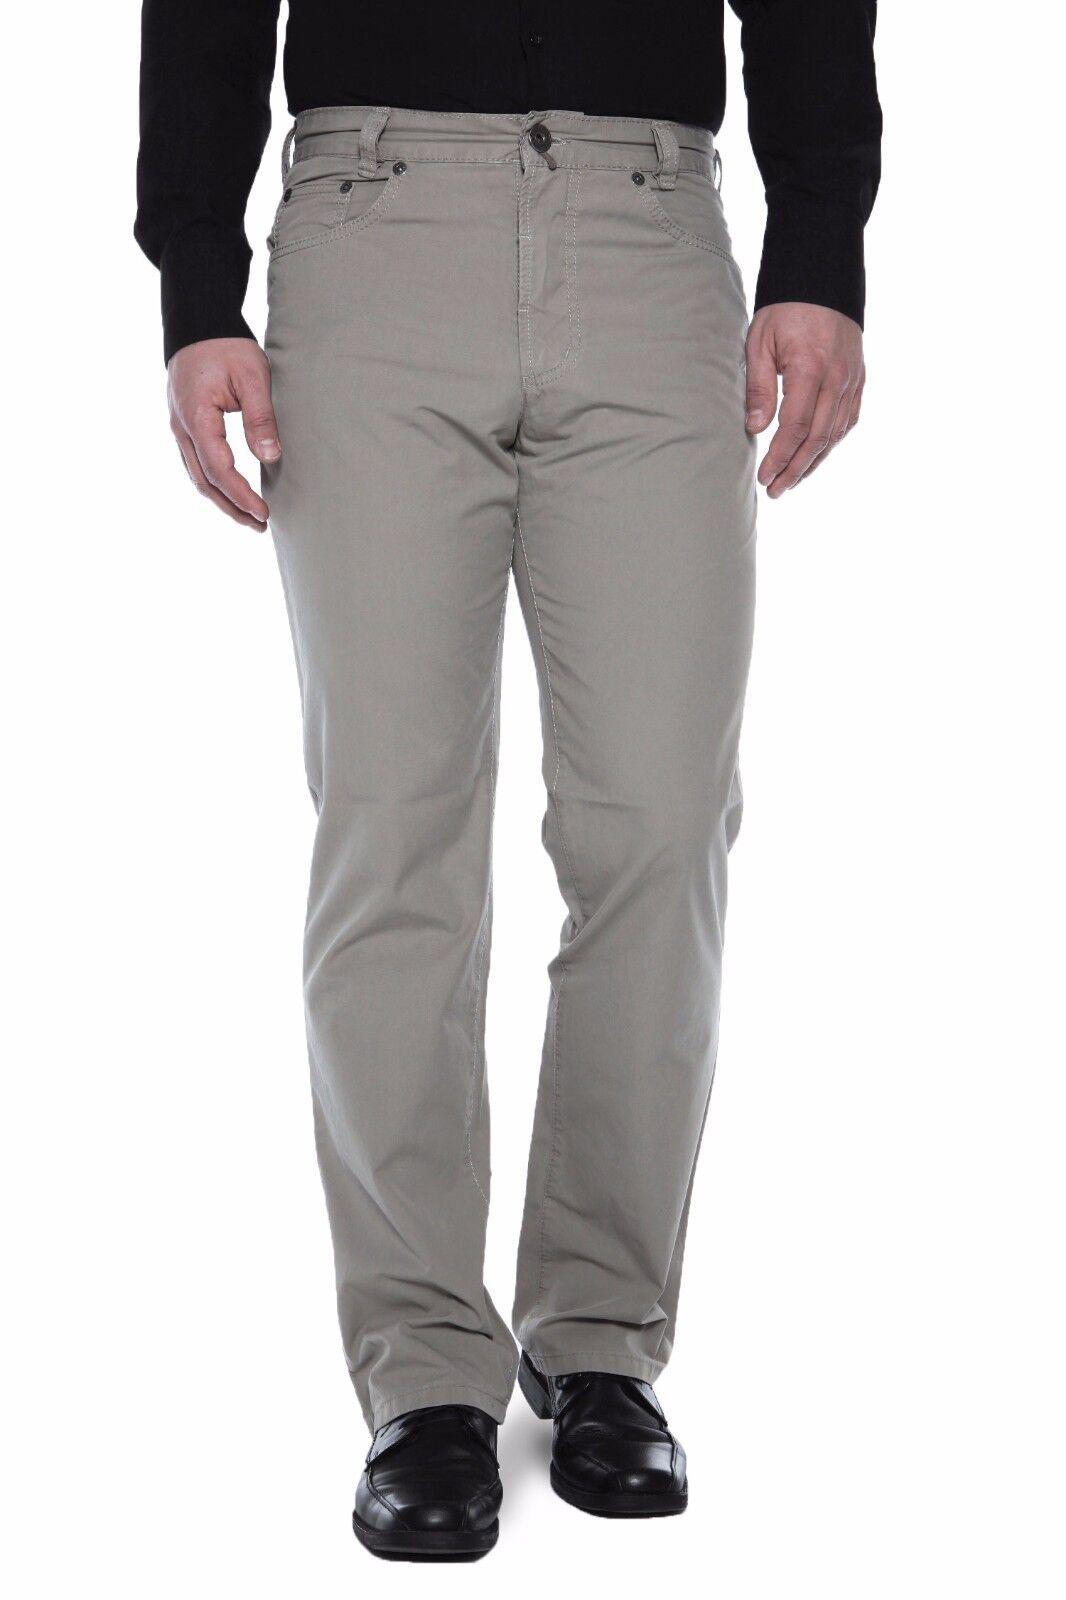 Joker Jeans Summer Harlem Walker (Comfort Fit) Stone Grey Cross Twill